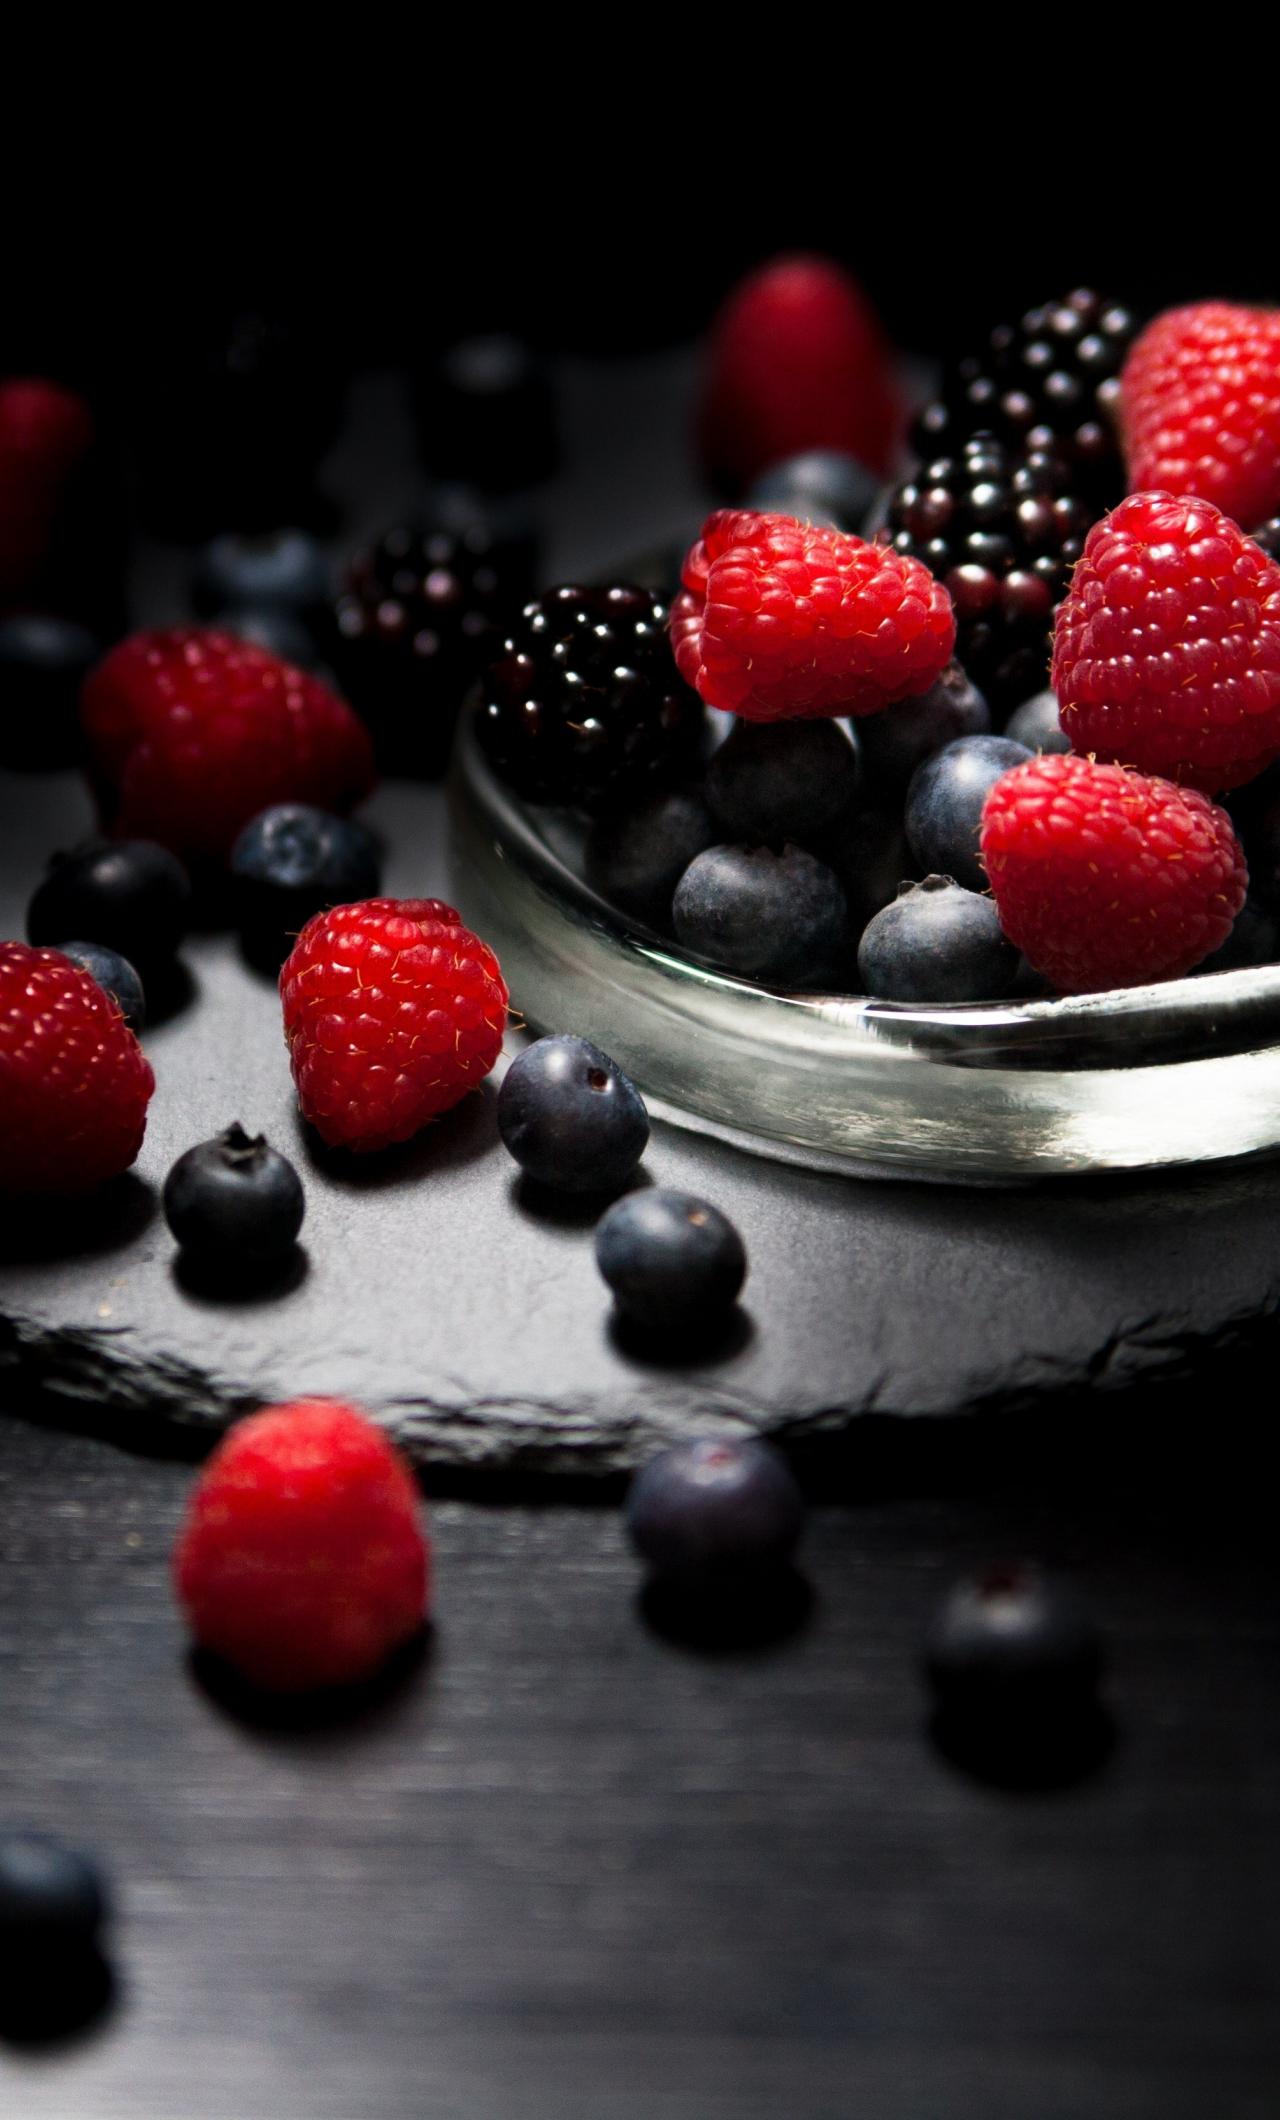 1280x2120 wallpaper Dark mood, food, fruits, blueberry, raspberry, blackberry, 4k